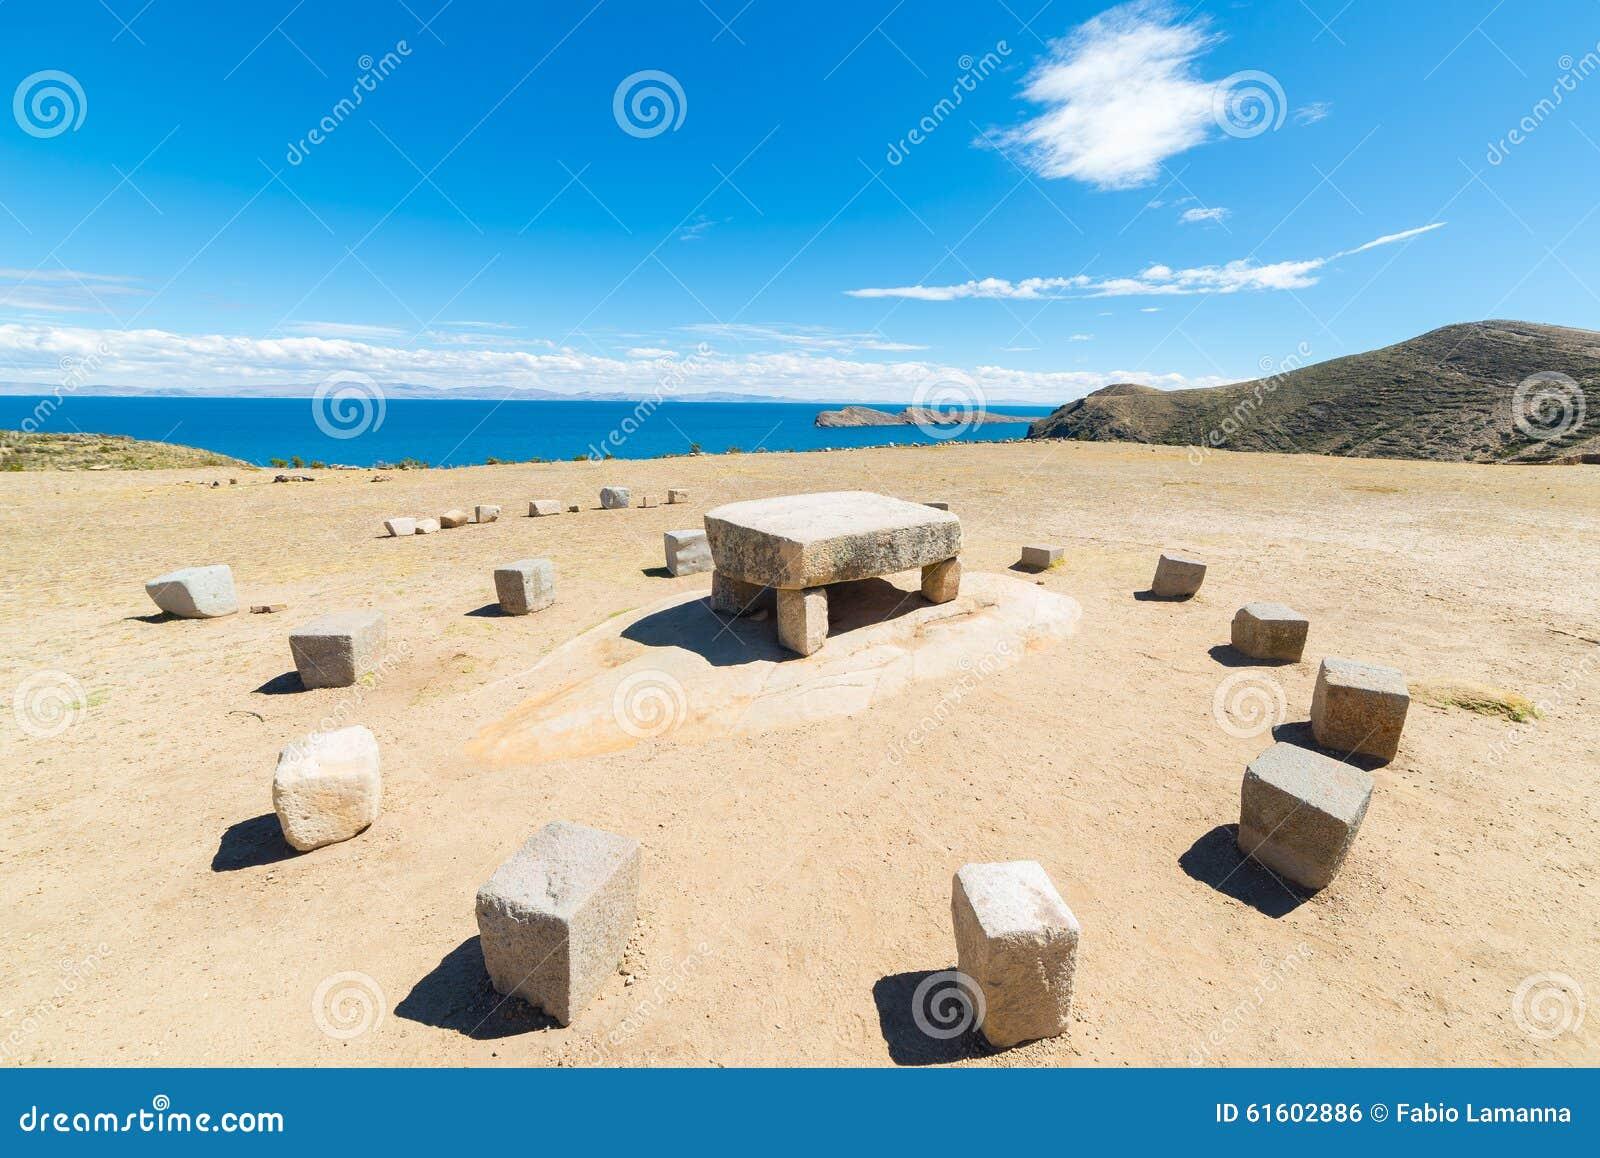 Inca s sacrifice table on Island of the Sun, Bolivia